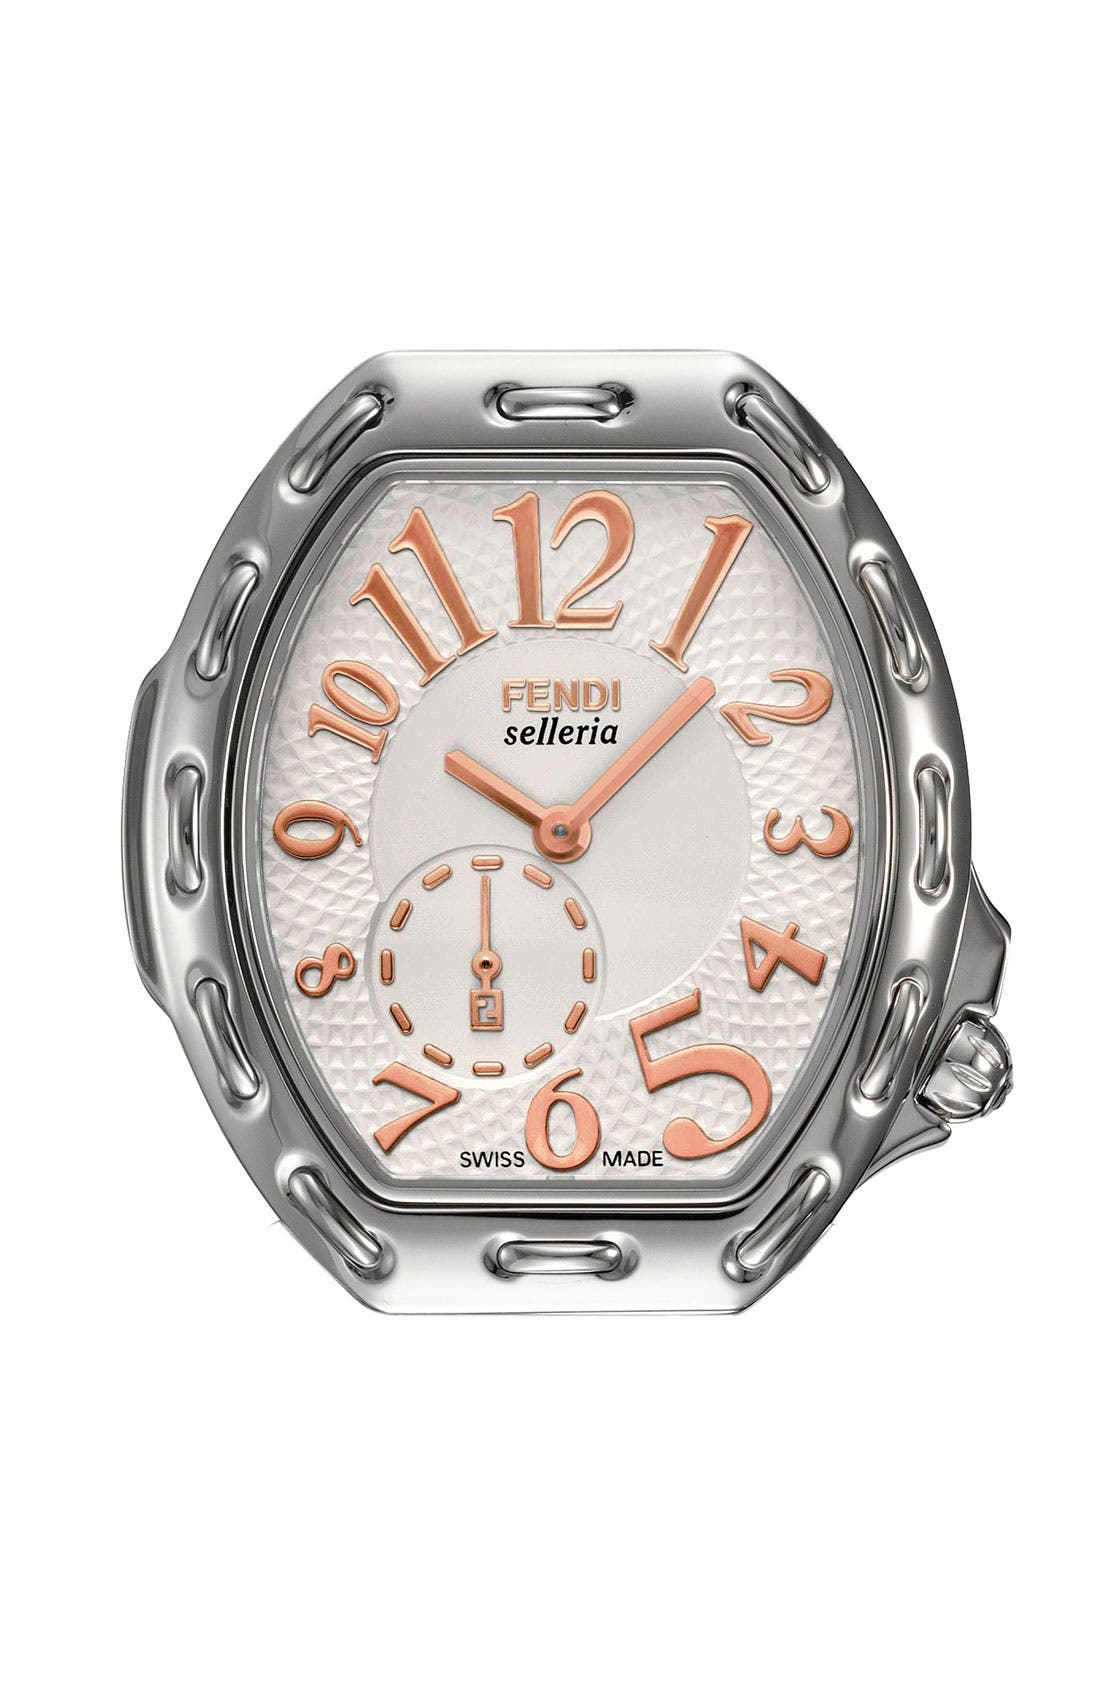 Main Image - Fendi 'Selleria' Tonneau Watch Case, 33mm x 38mm